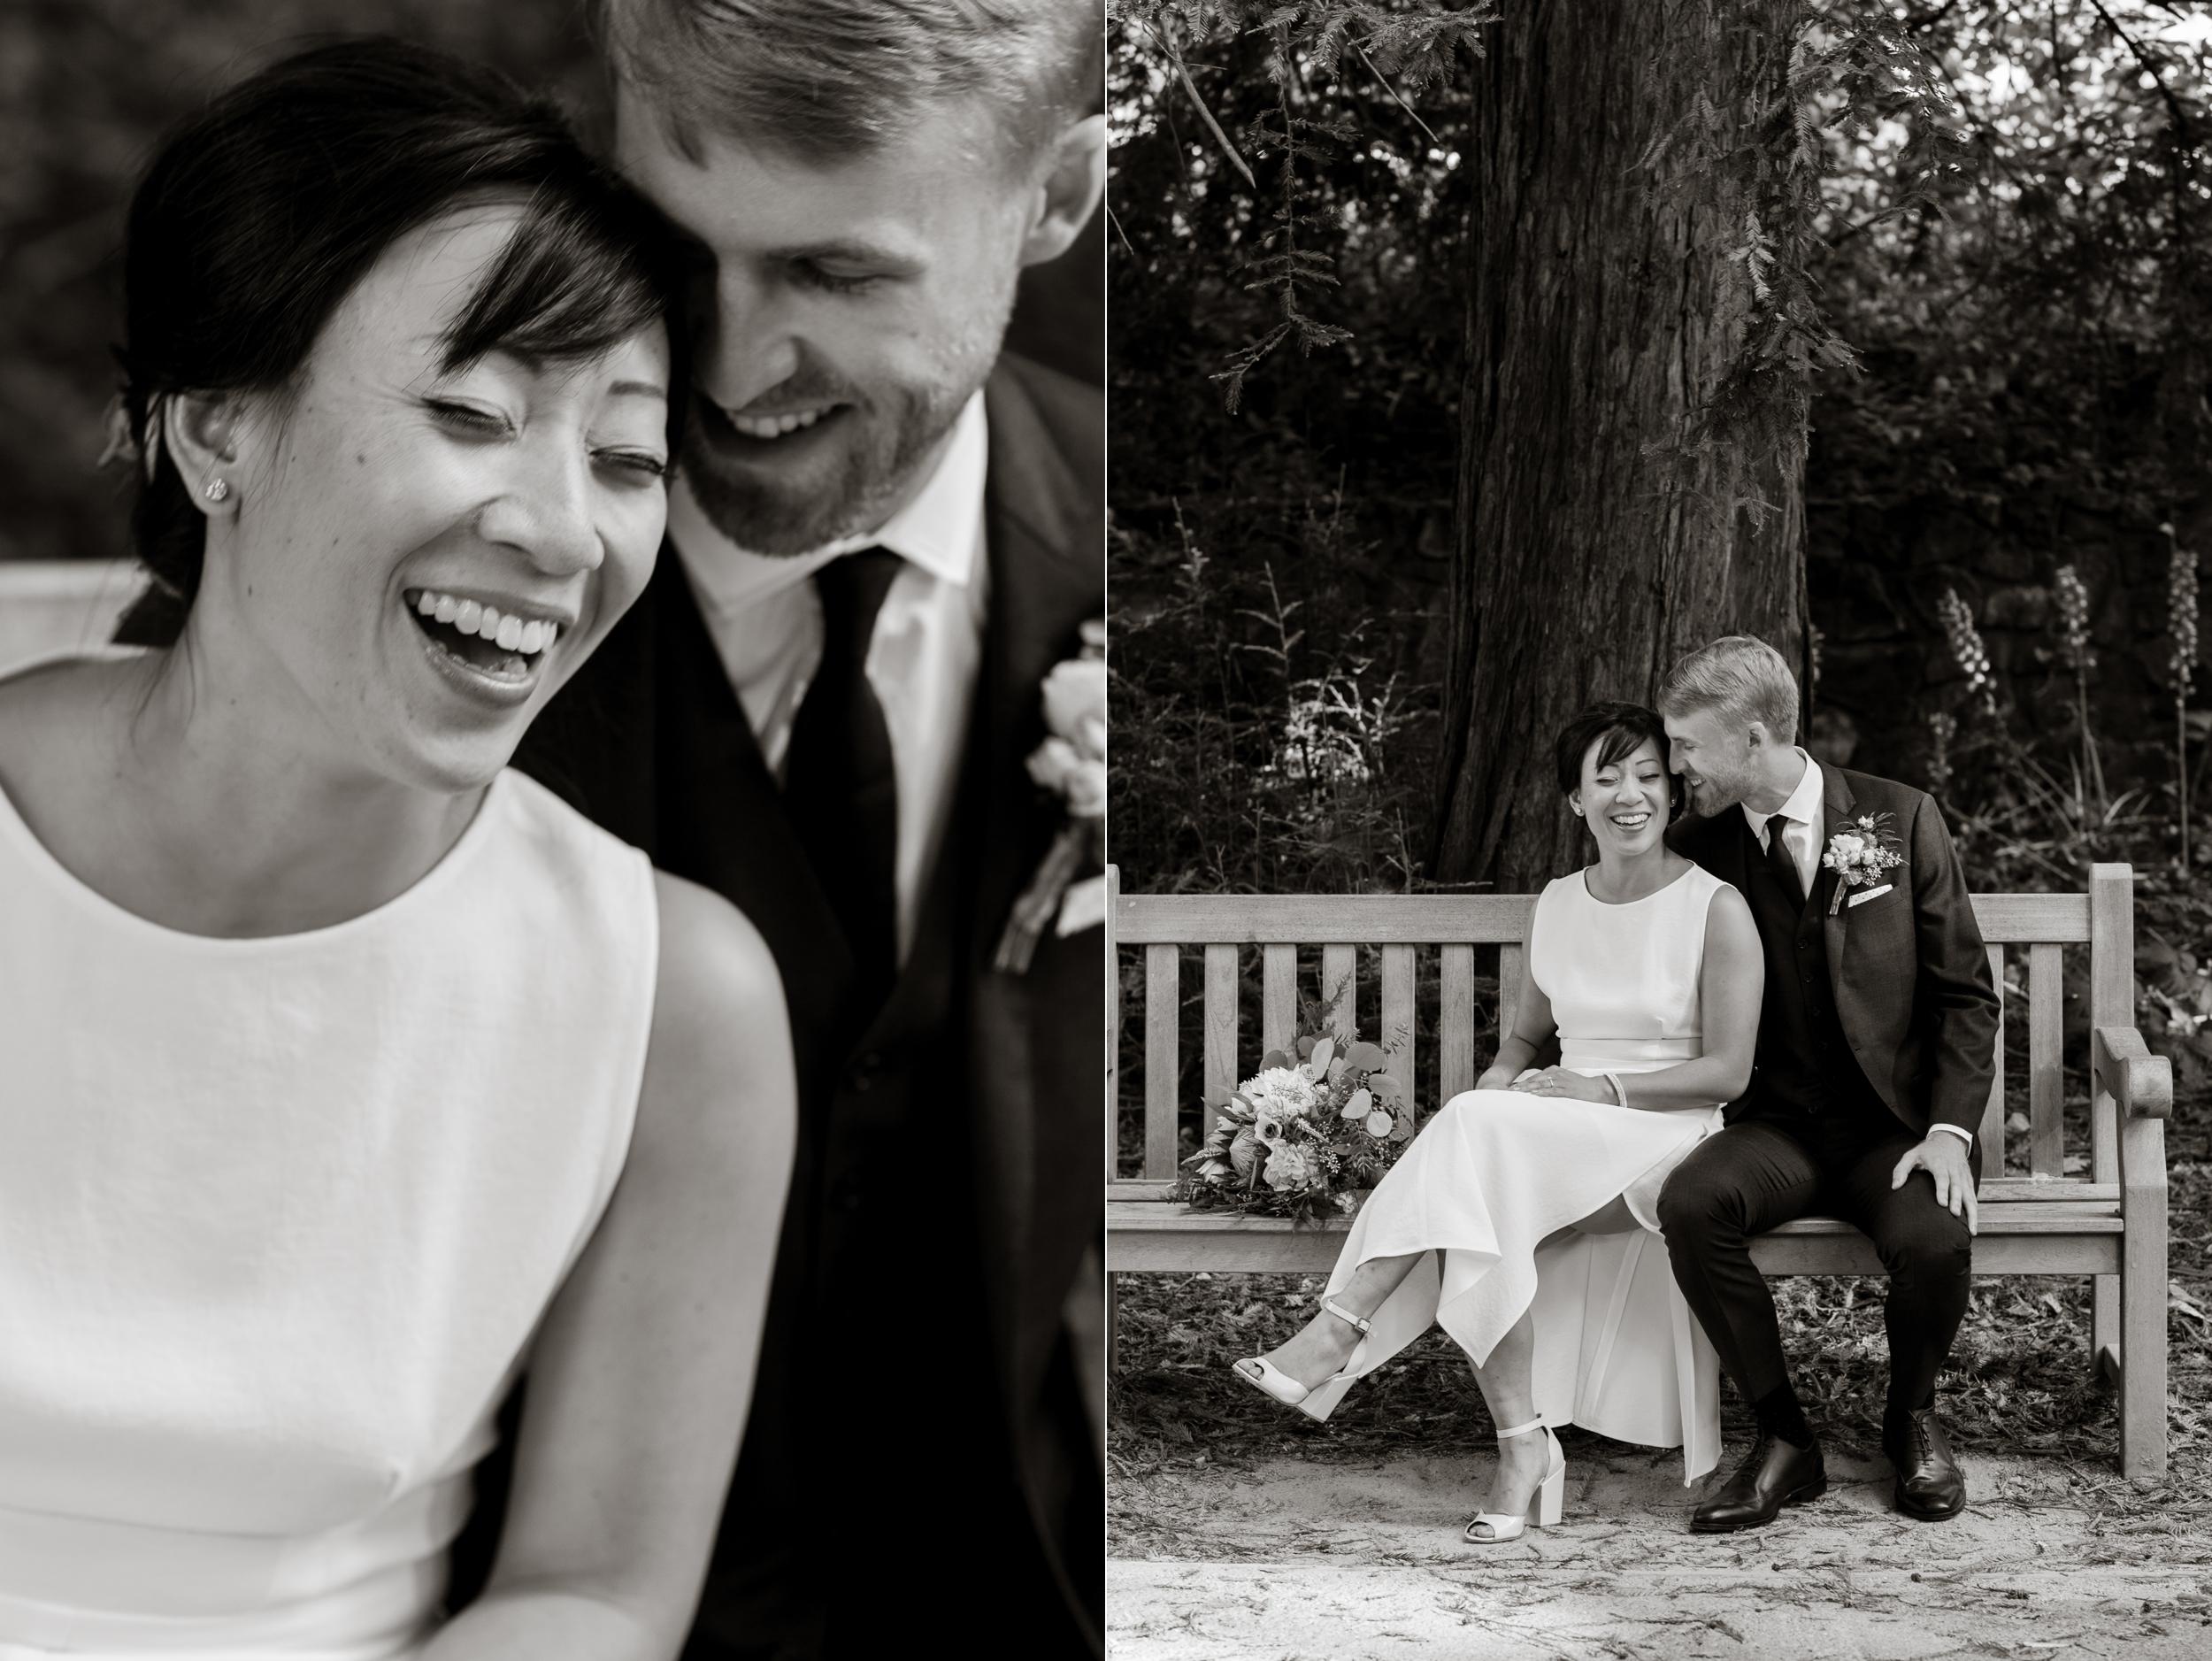 faculty-club-berkeley-wedding-photographer-vc043.jpg